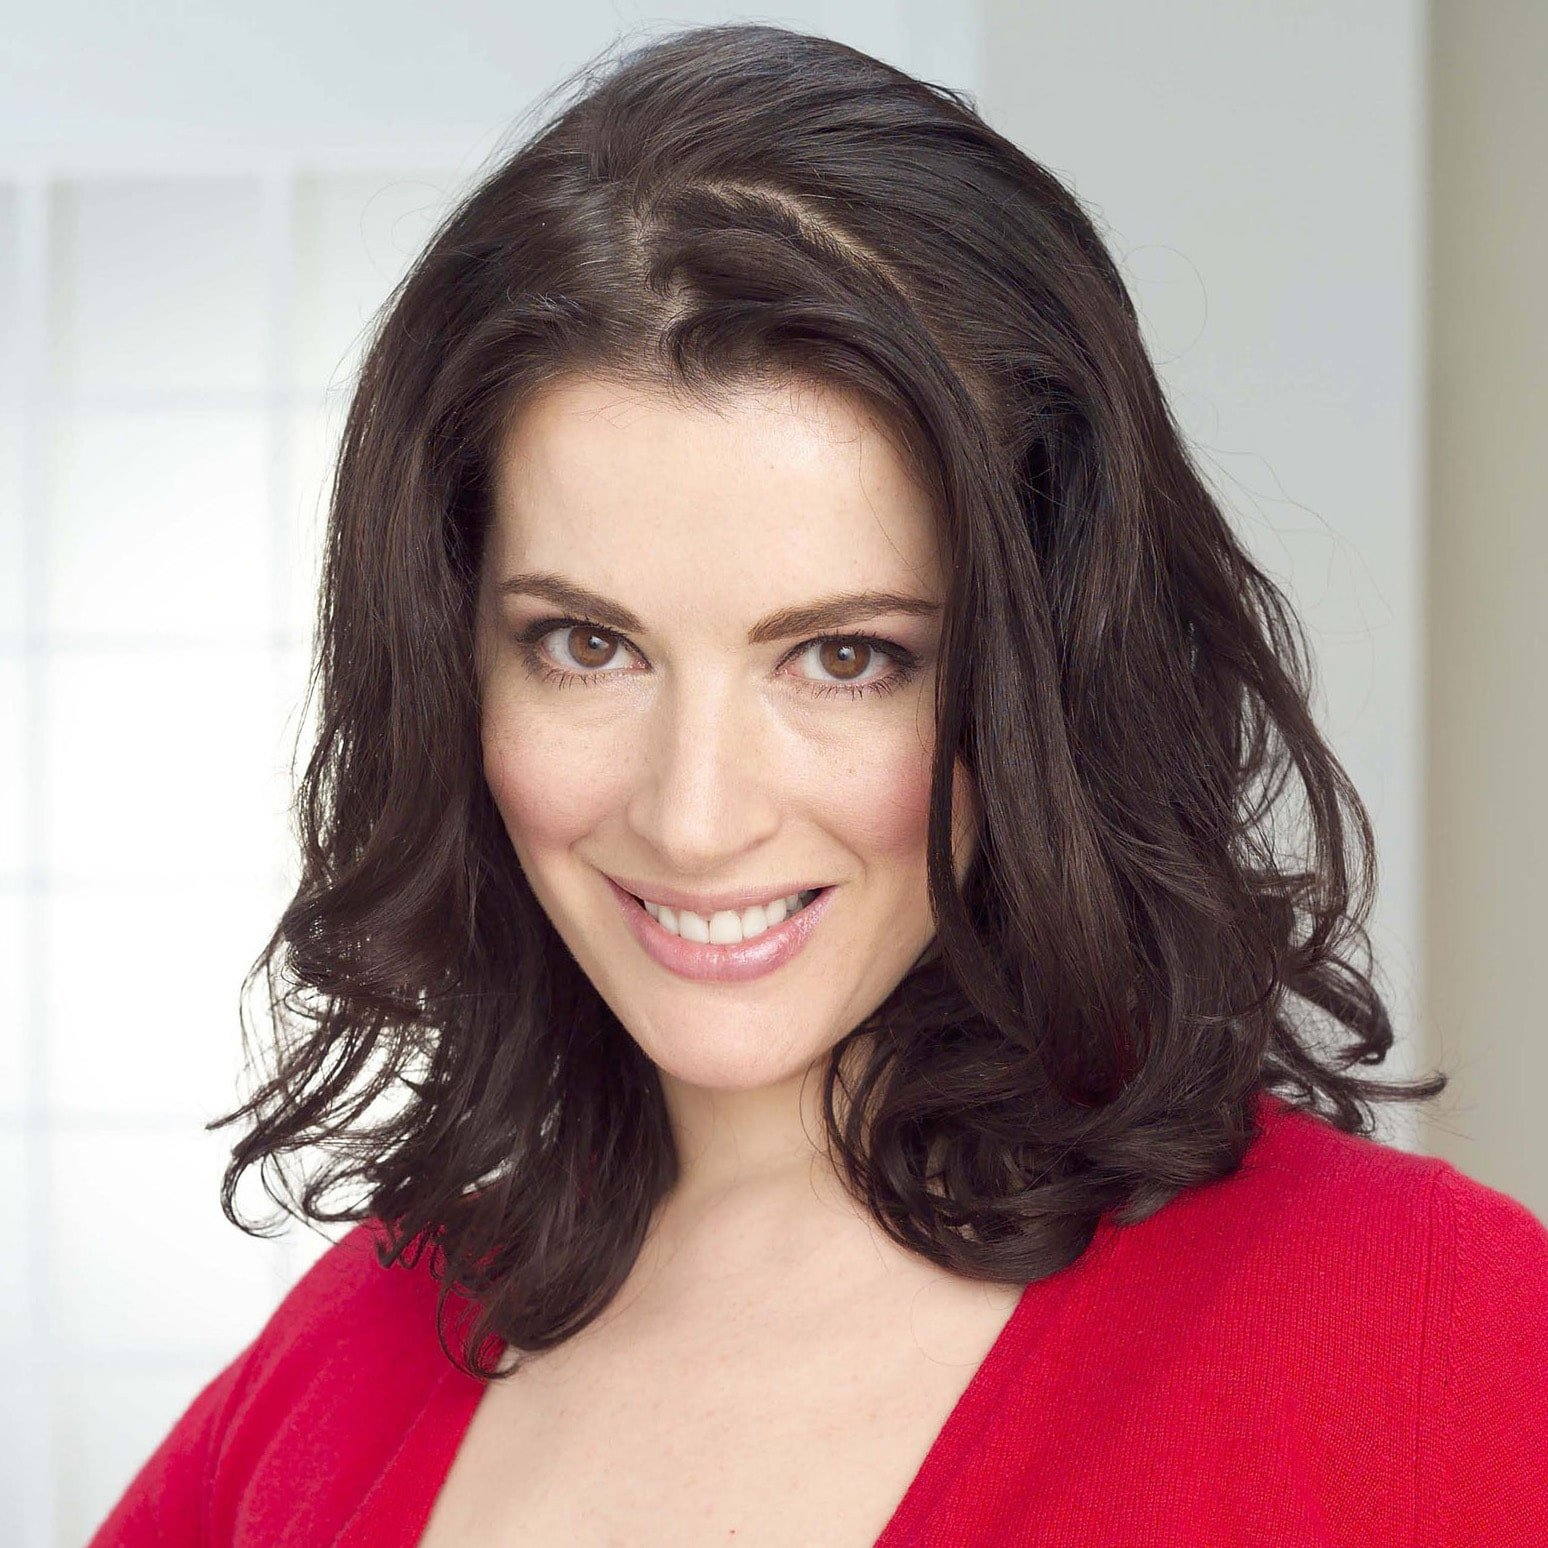 Nigella-Lawson-chef-food-writer-presenter-speaker-host-at-Great-British-Speakers